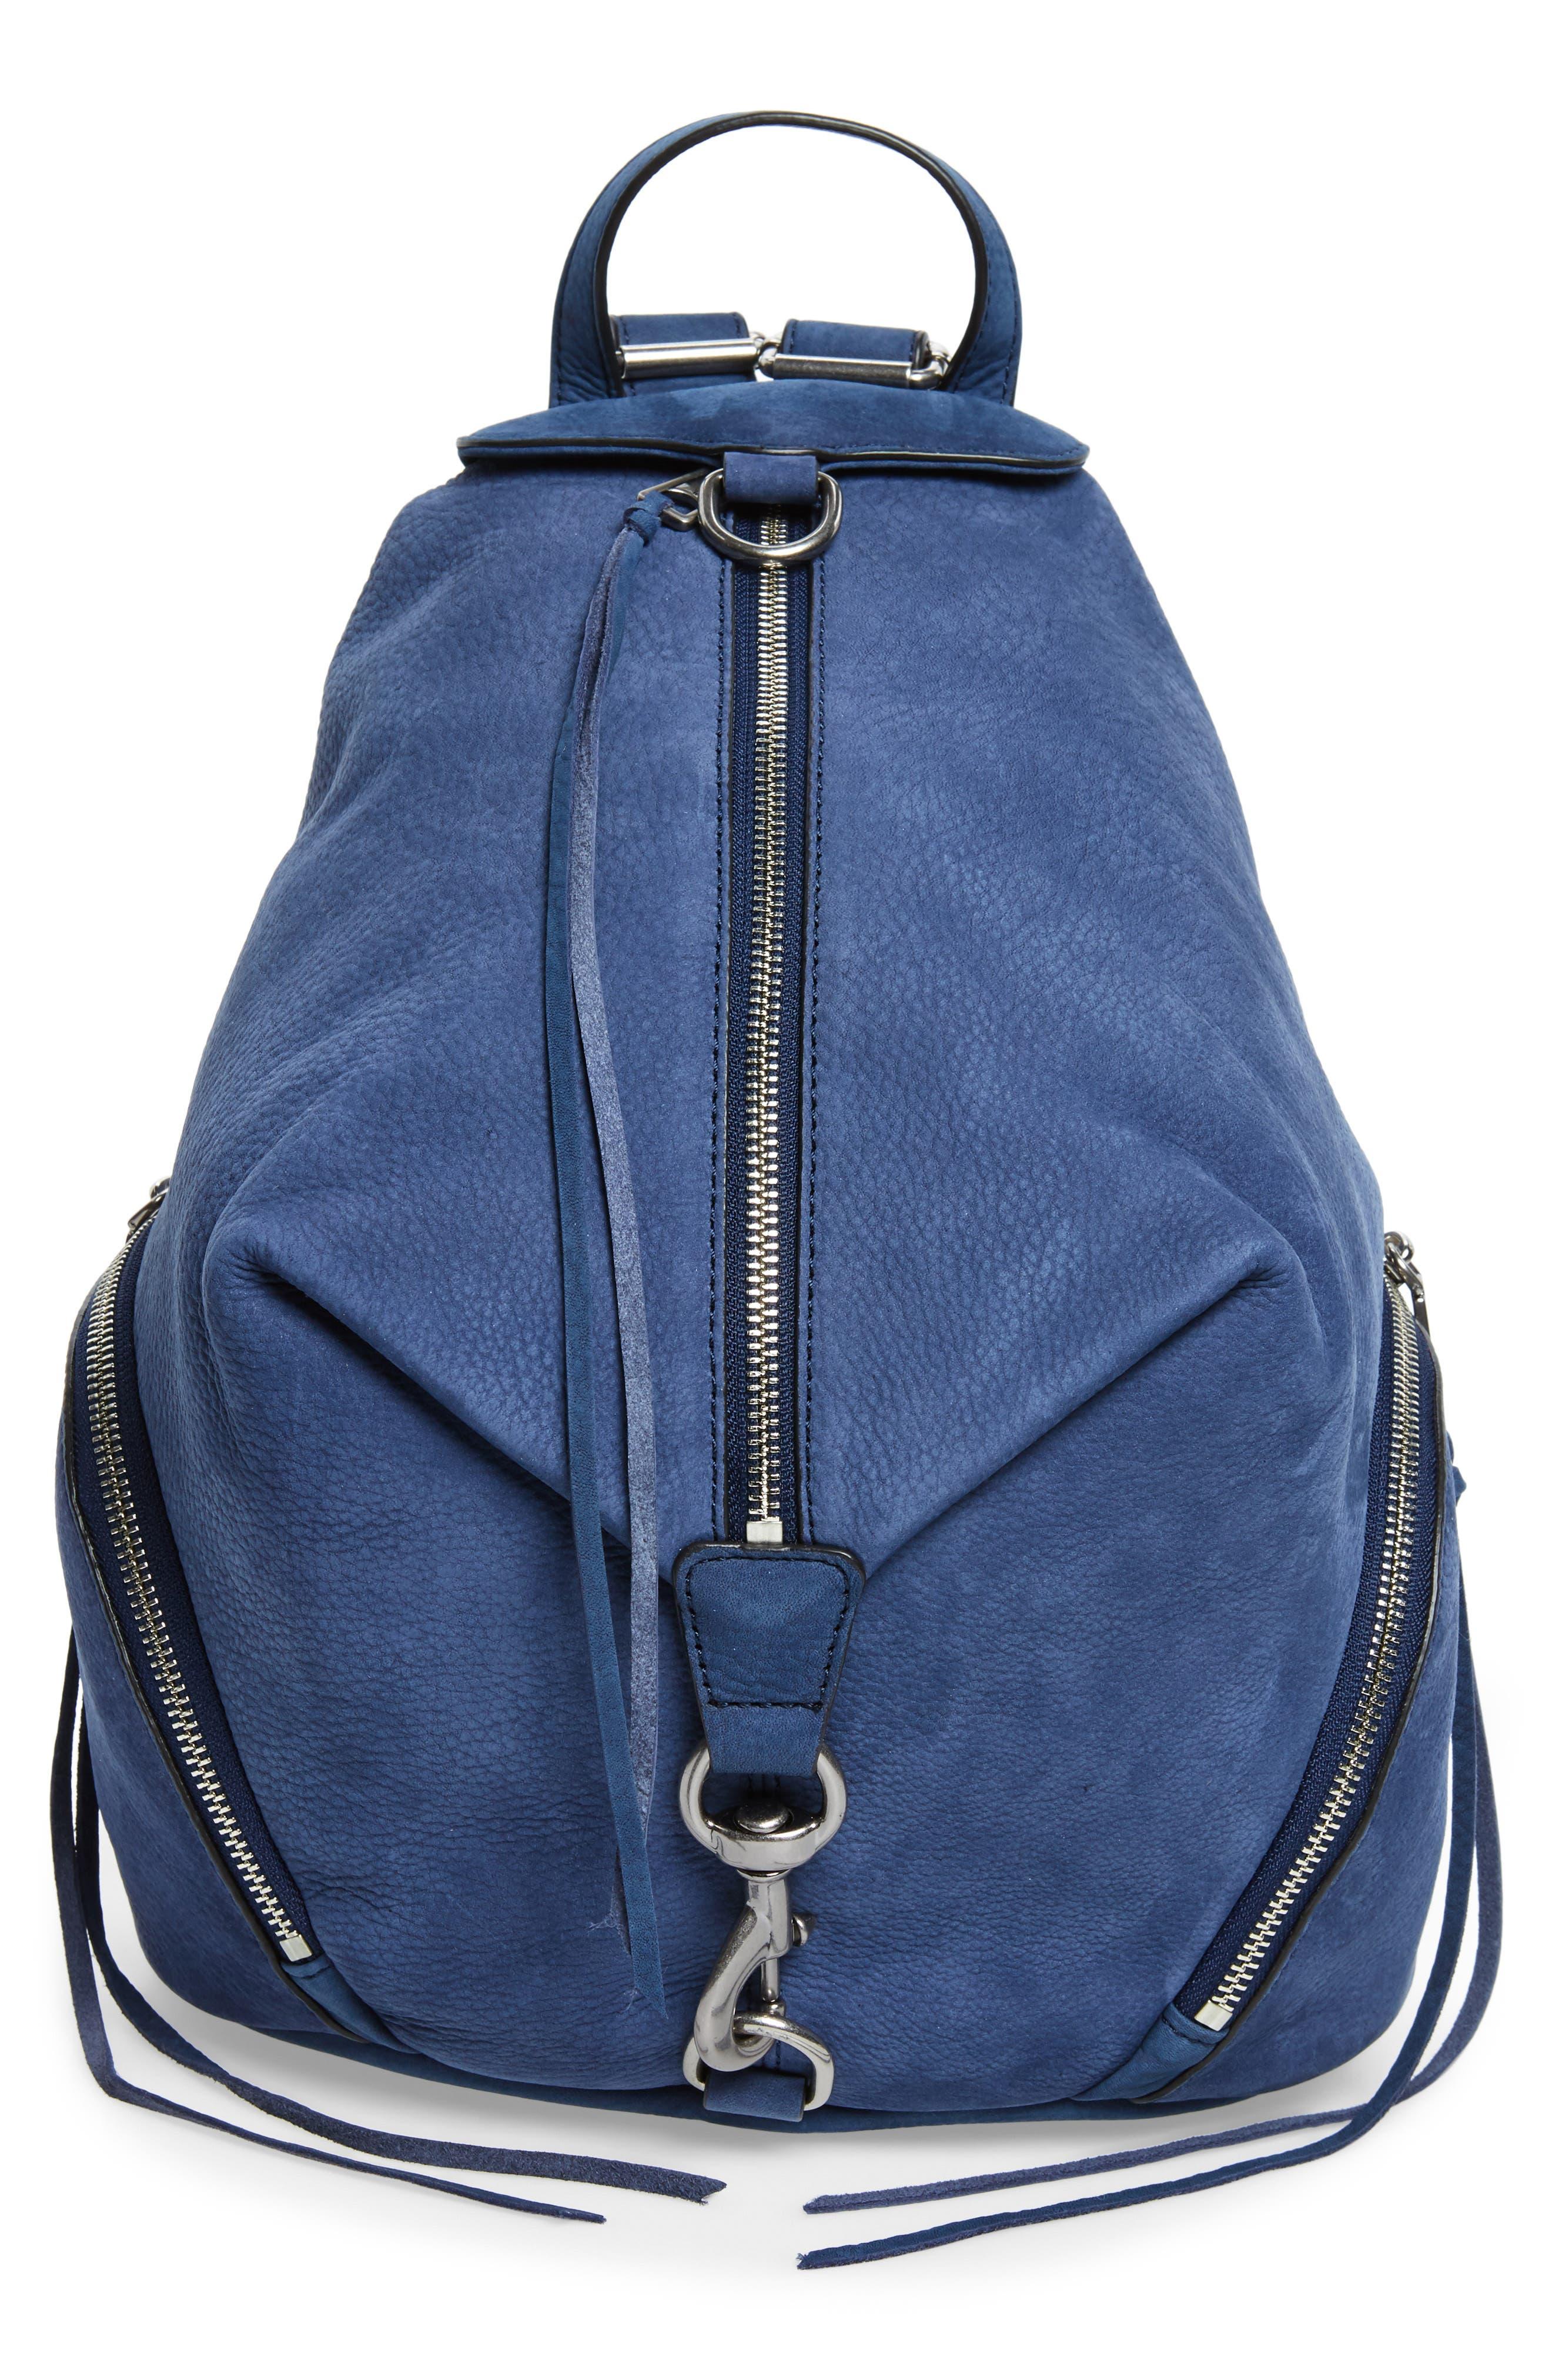 Main Image - Rebecca Minkoff Julian Convertible Nubuck Leather Backpack